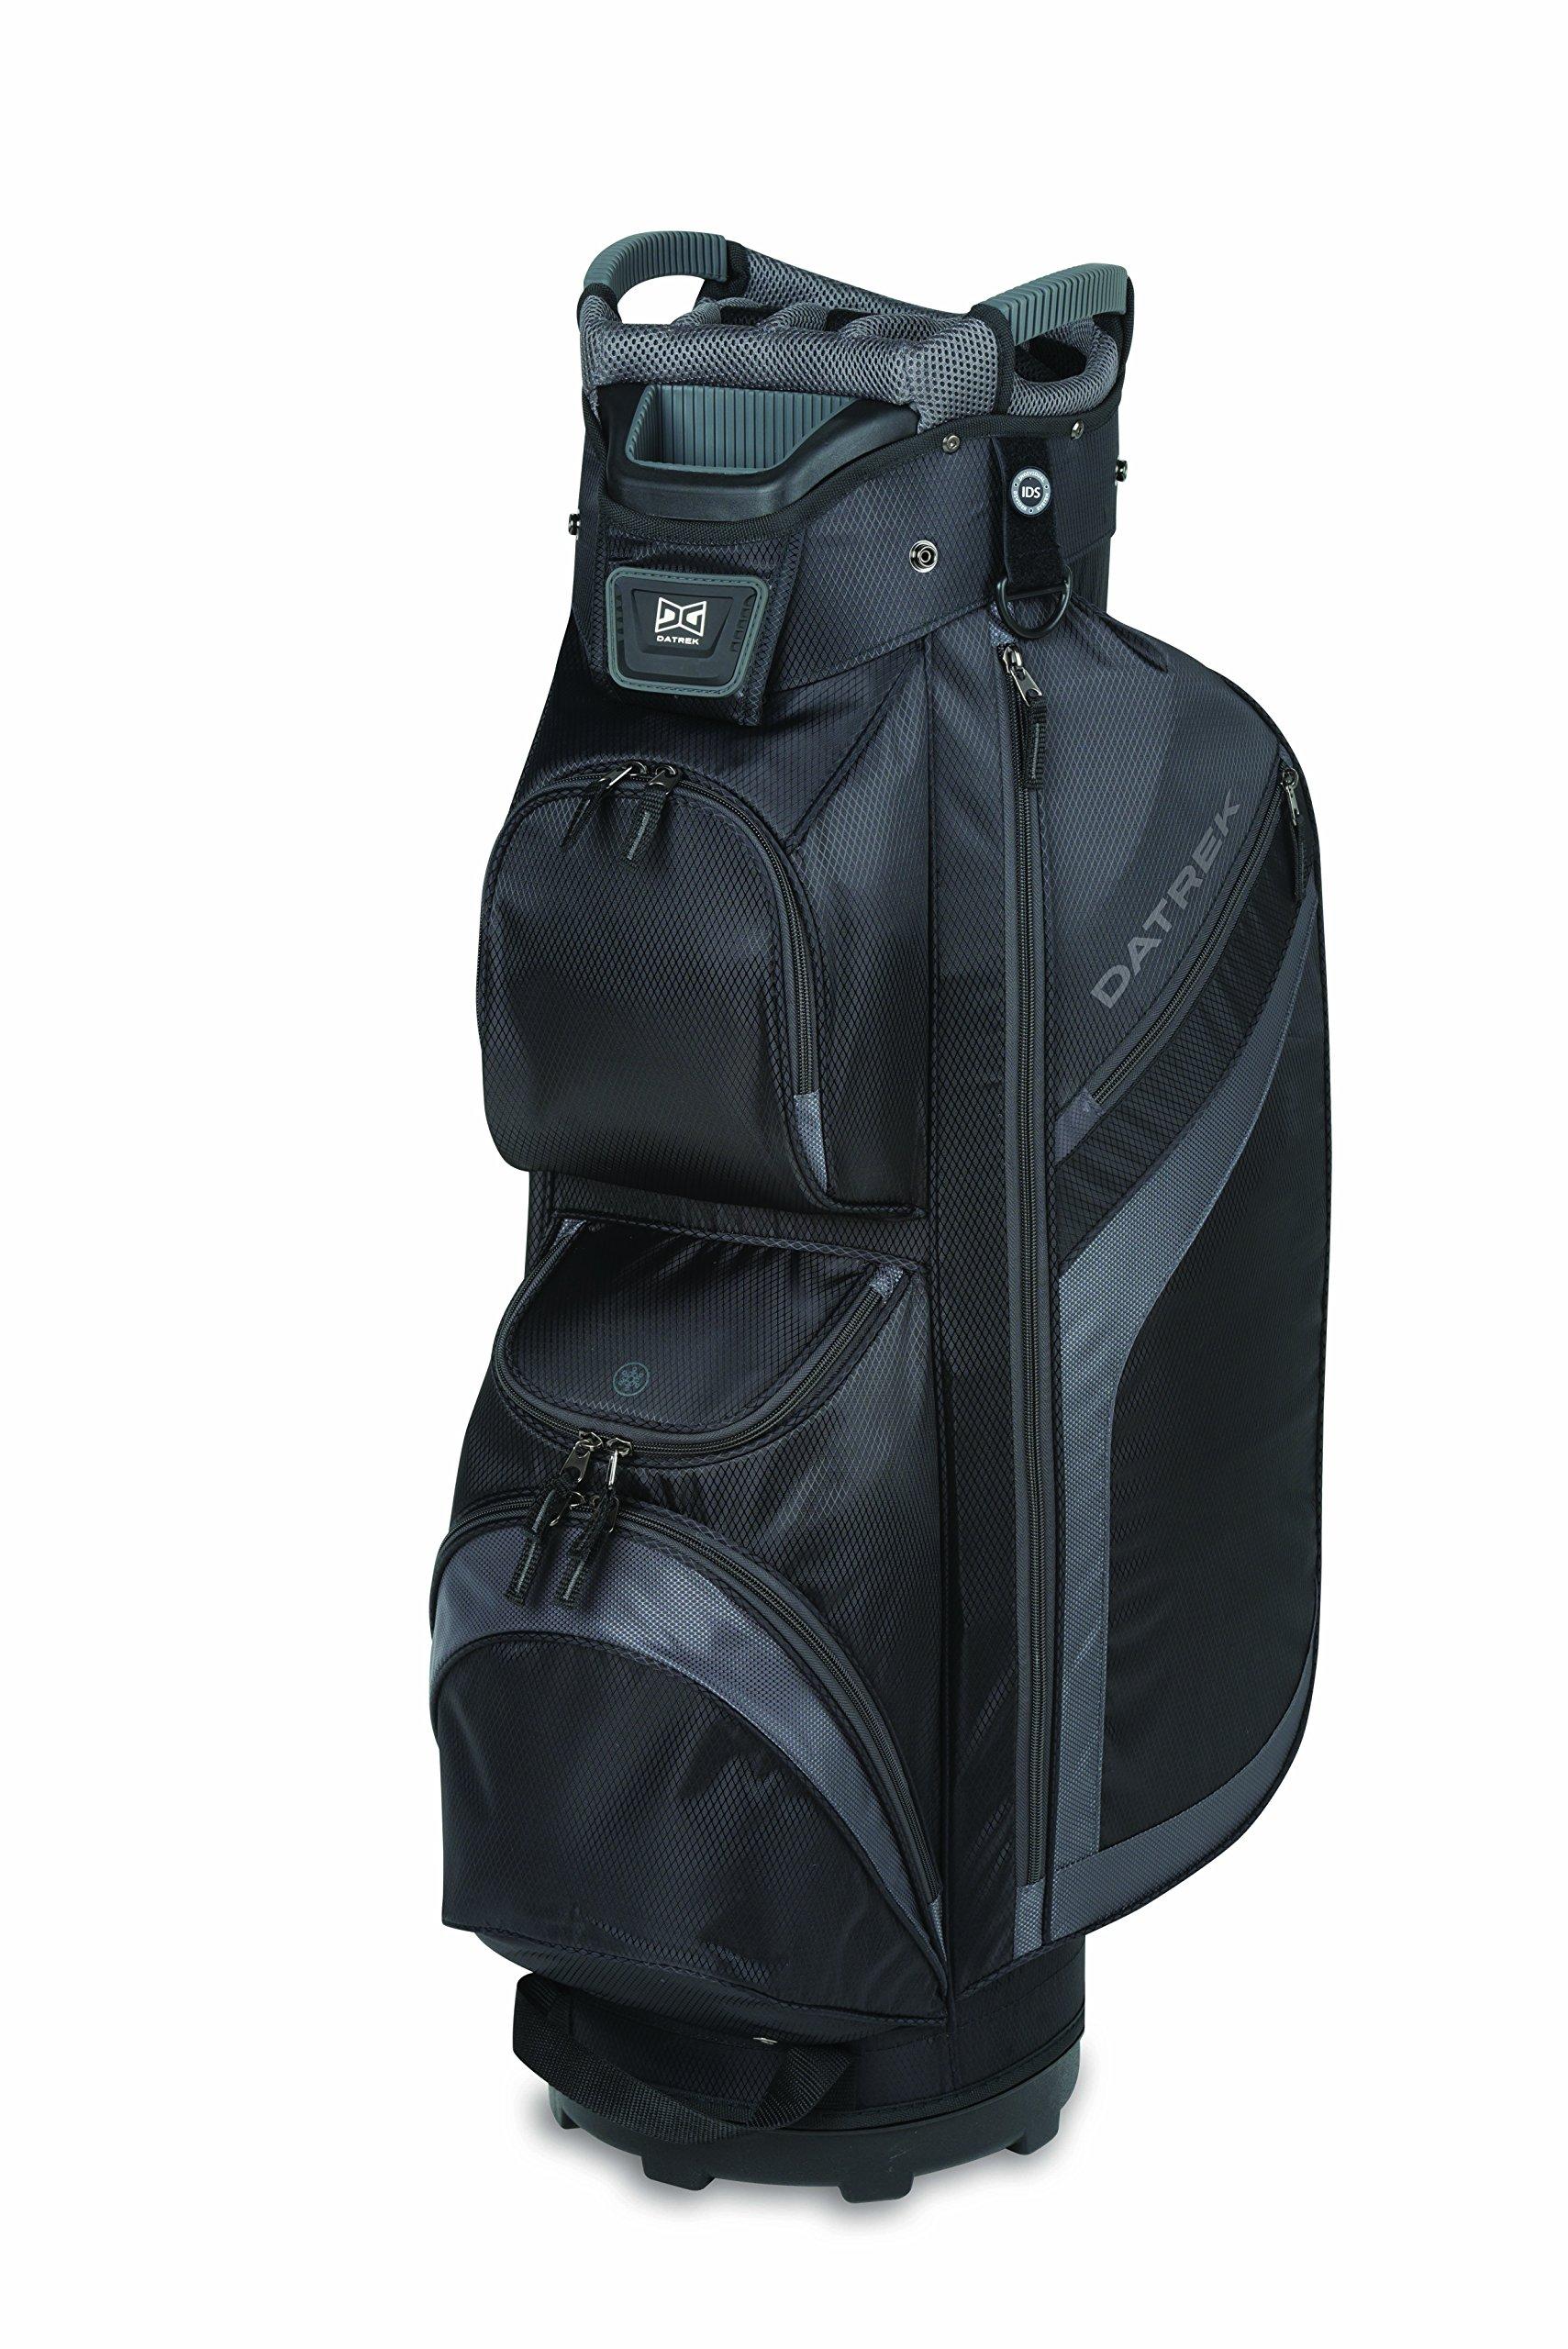 Datrek DG Lite II Cart Bag Black/Charcoal DG Lite II Cart Bag